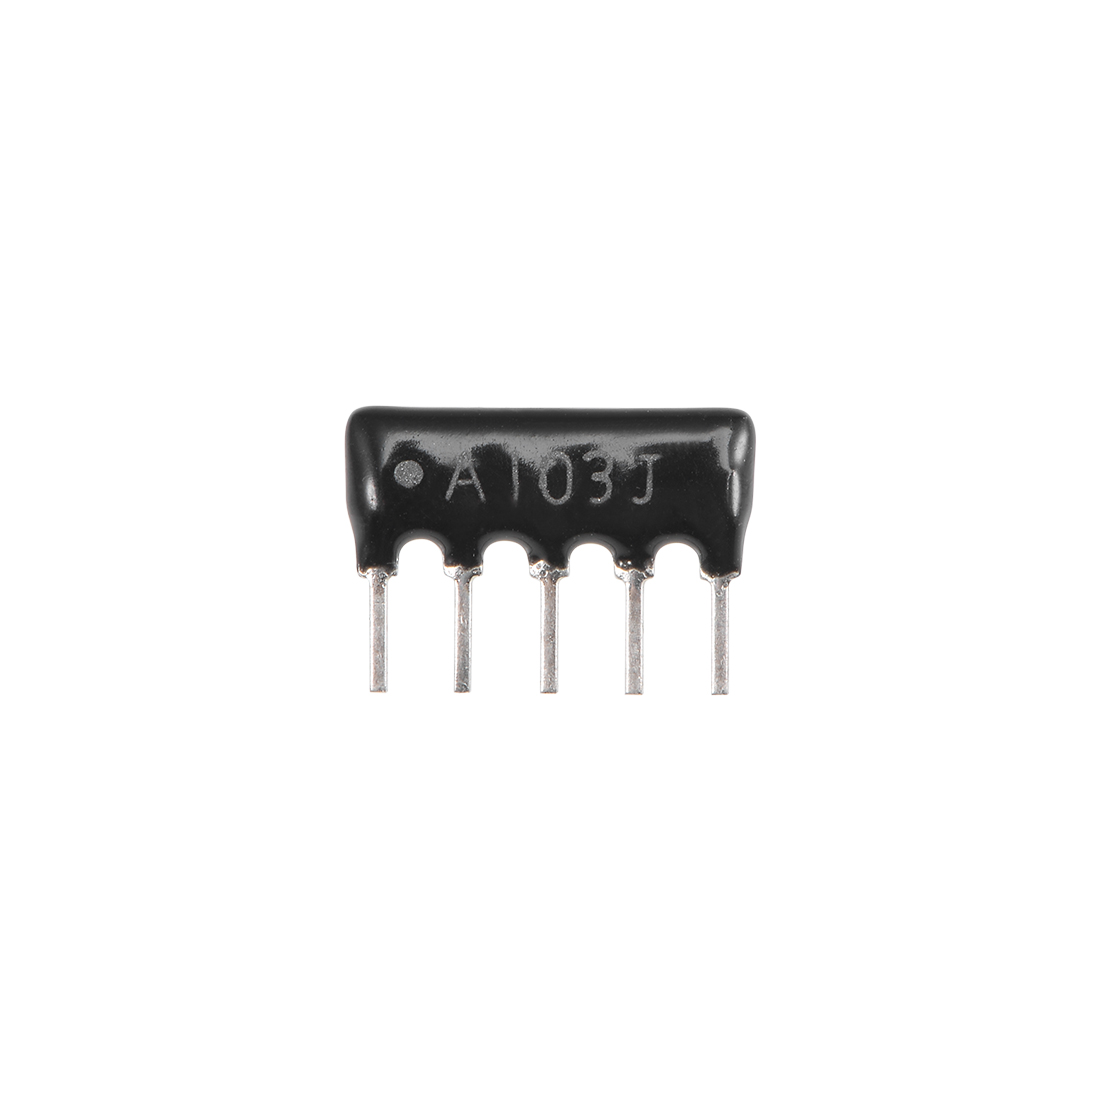 10K Ohm Resistor Network 1/8W SIP-5 Array 2.54mm Bussed Type 5% Tolerance 20pcs